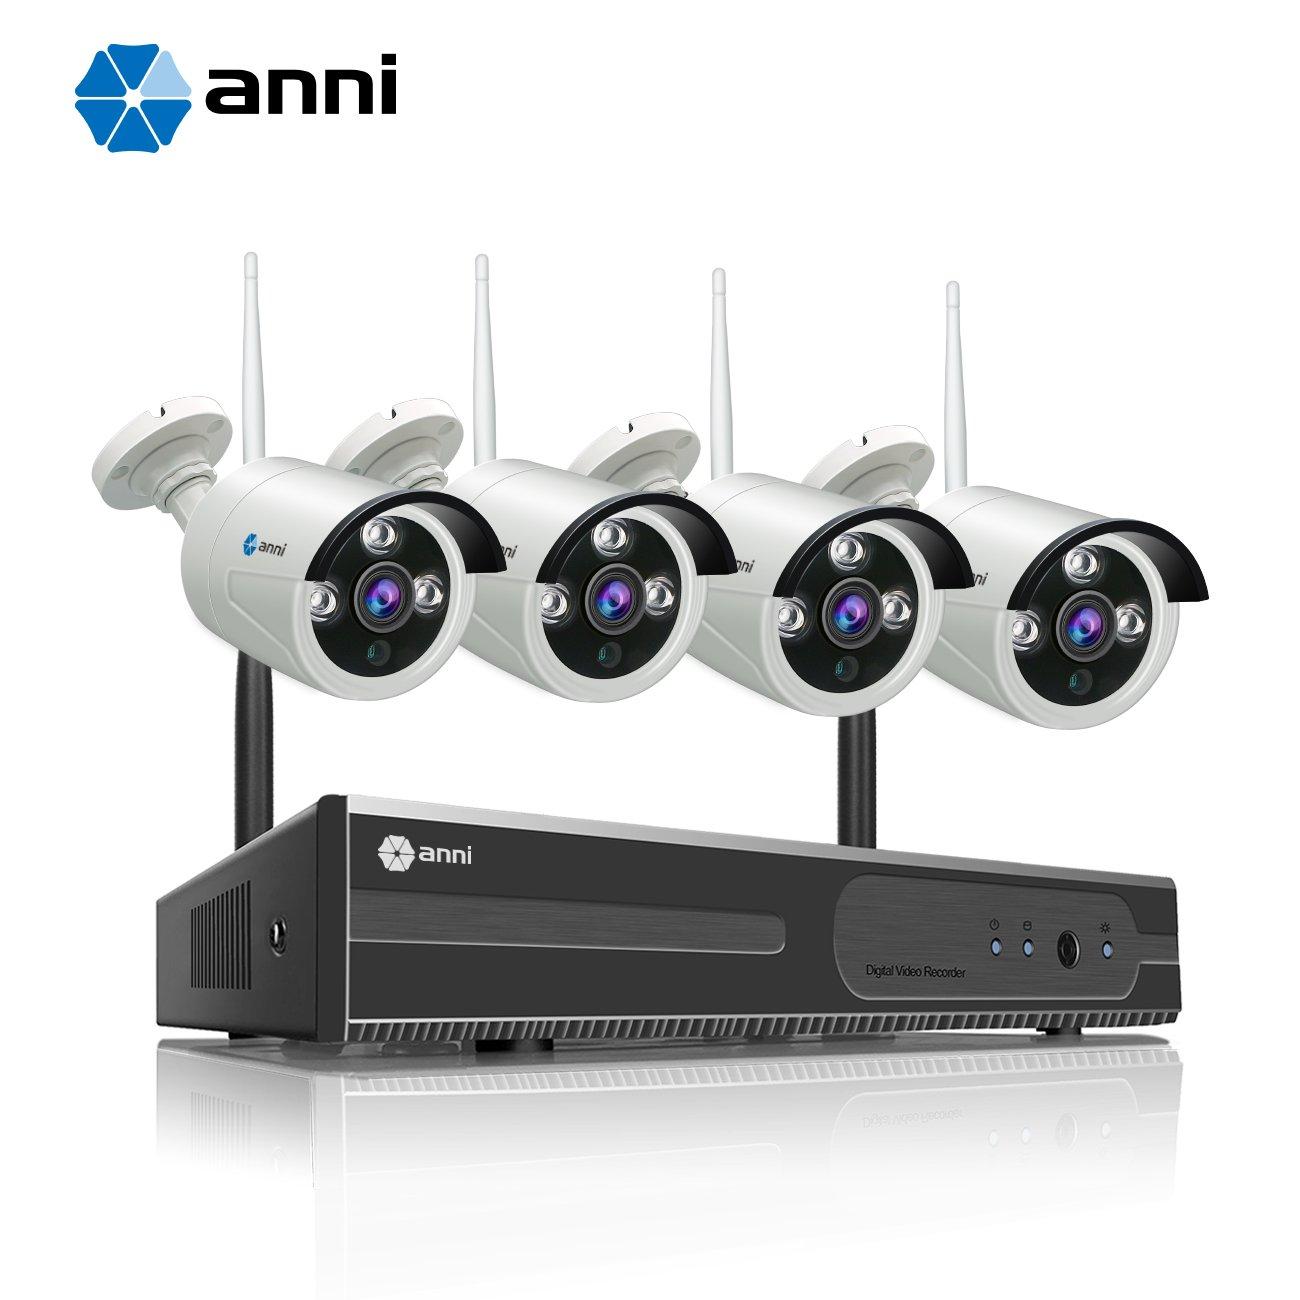 Amazon.com: anni 4CH 720P HD NVR Wireless Security CCTV Surveillance ...